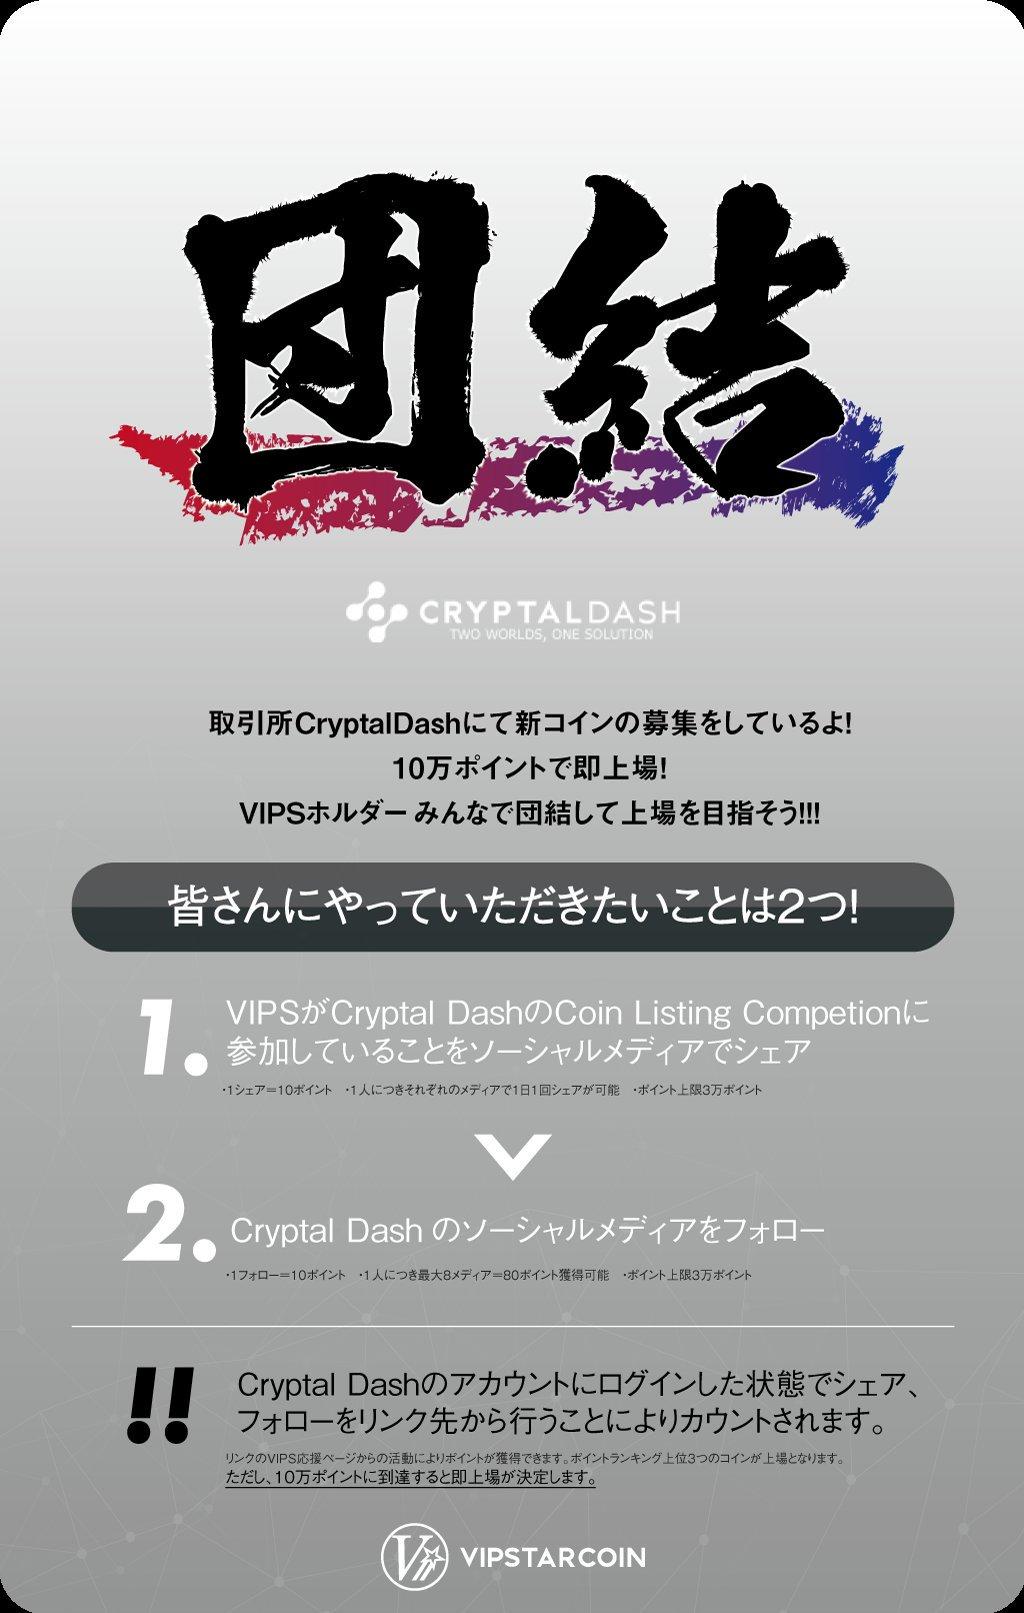 "仮想通貨VIPSTAR【( ^ω^)公式】 on Twitter: ""【取引所Cryptal Dash上場投票"